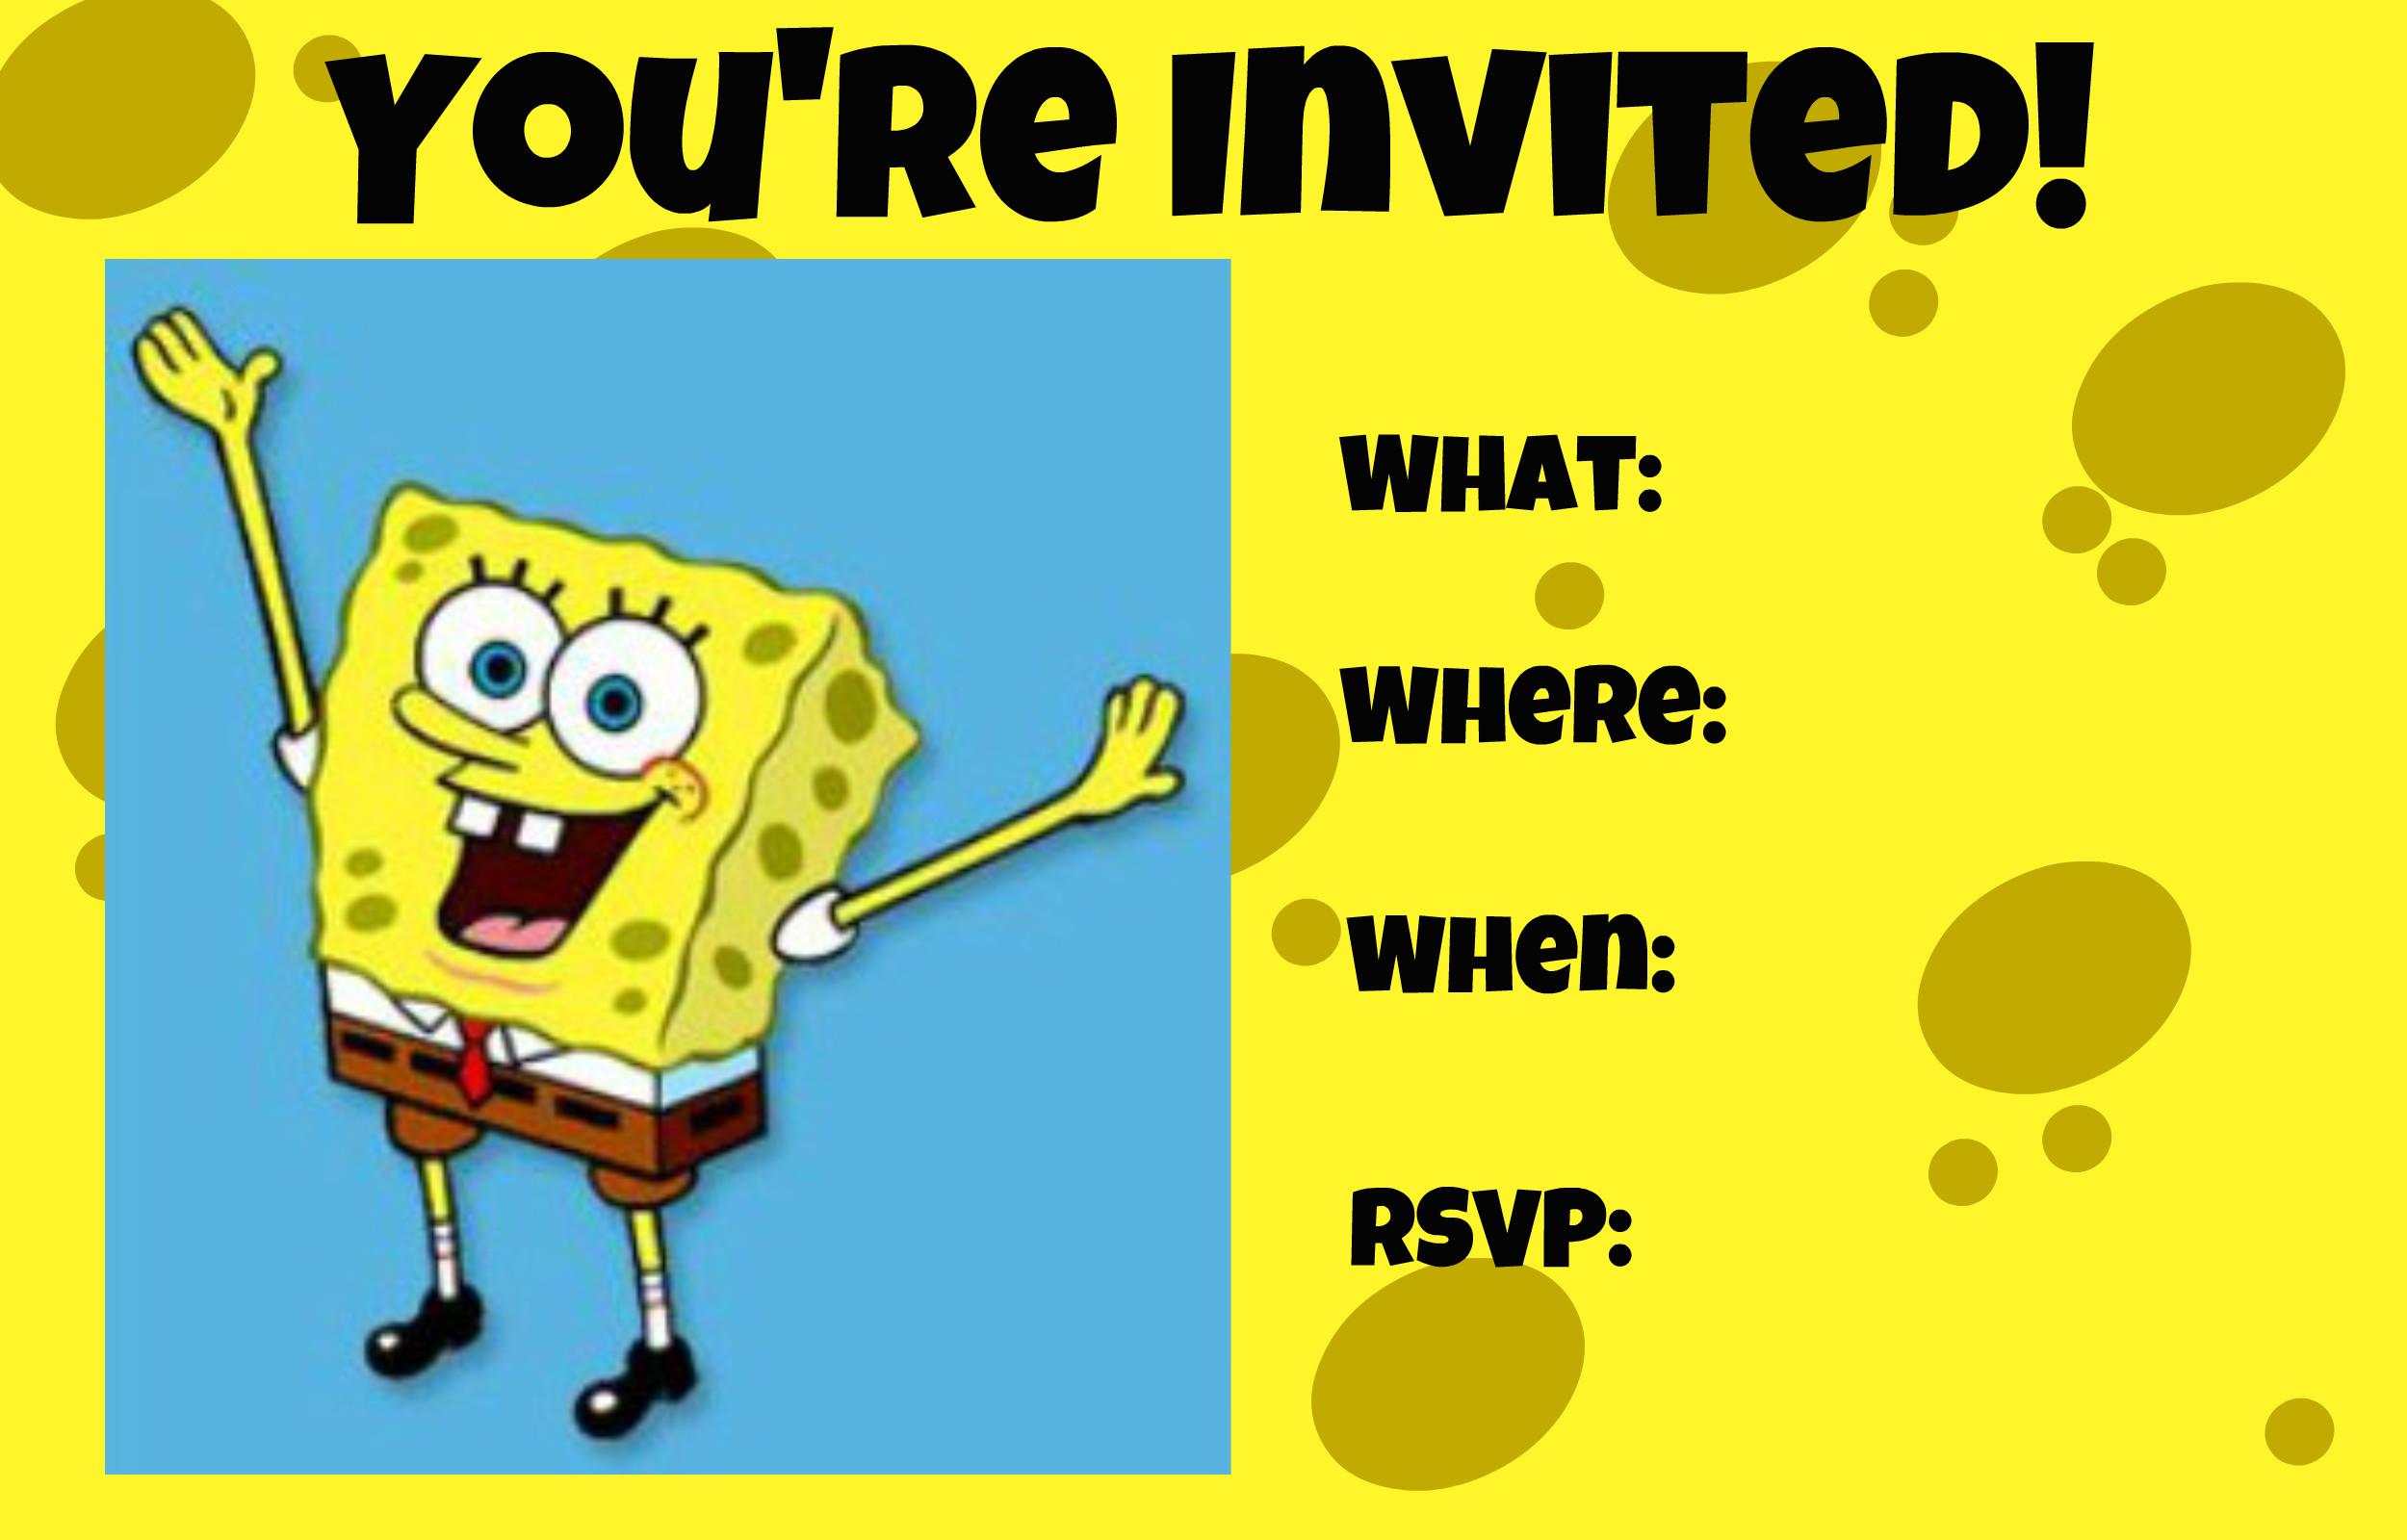 SpongeBob SquarePants invitation